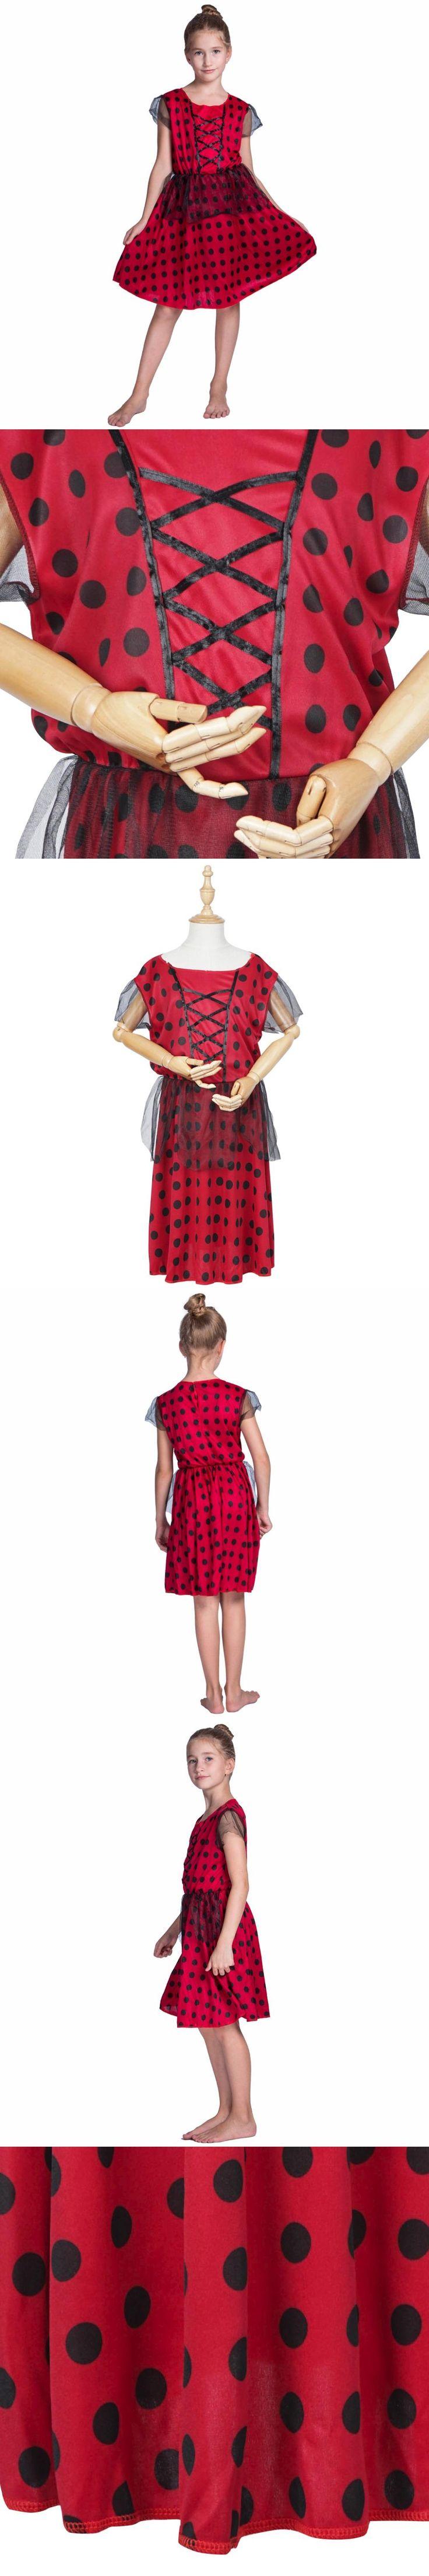 Girls Dress Lady Bug Costume Ladybug Cosplay Kids Polka Dot Children Red Bug Fancy Dress Skirt with Mesh for Halloween Carnival